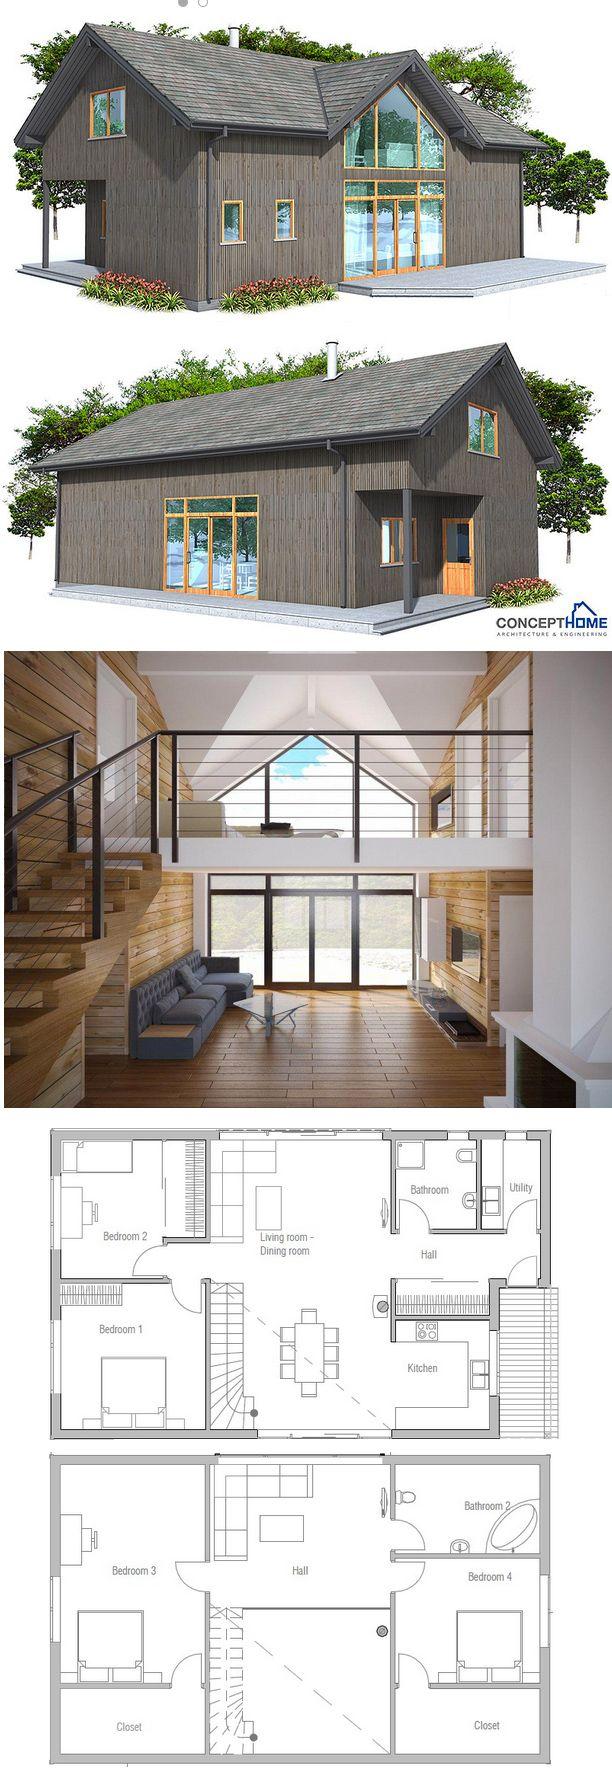 ccb90e89310e4b3b7b6aff6907e716fc - View Small House Plans With Second Floor  Pics